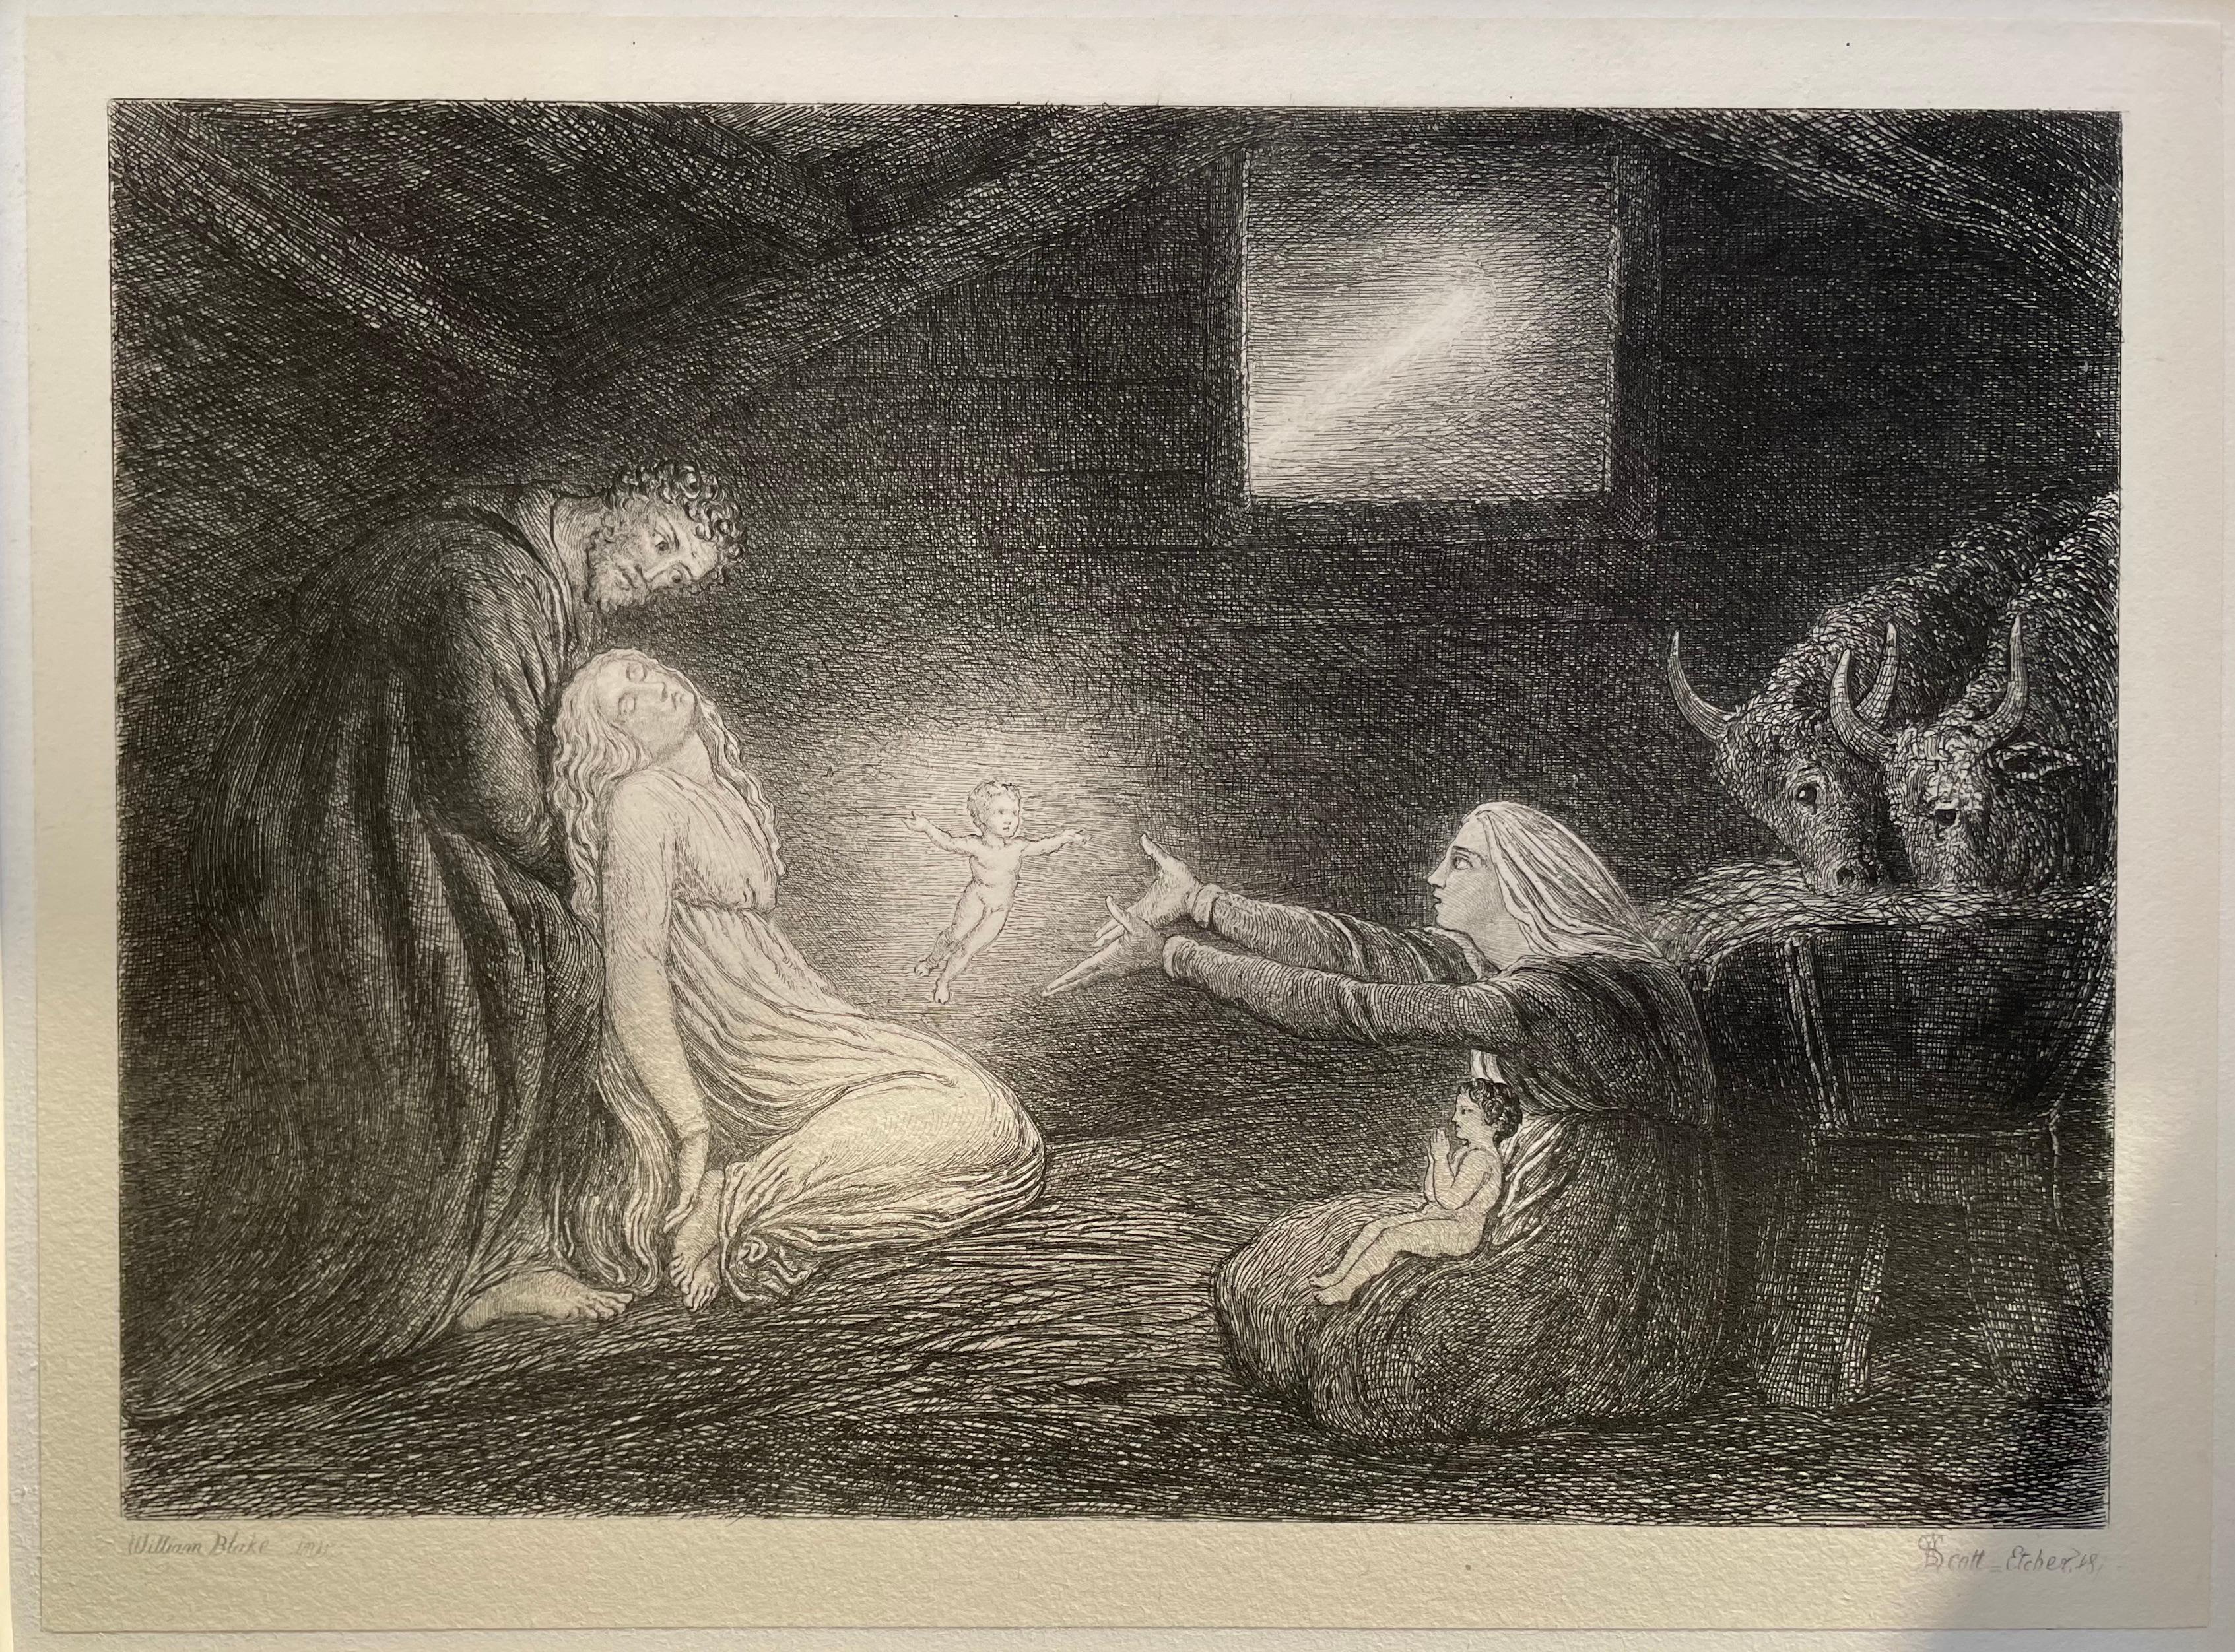 Nativity - 1870s etching by William Bell Scott after William Blake